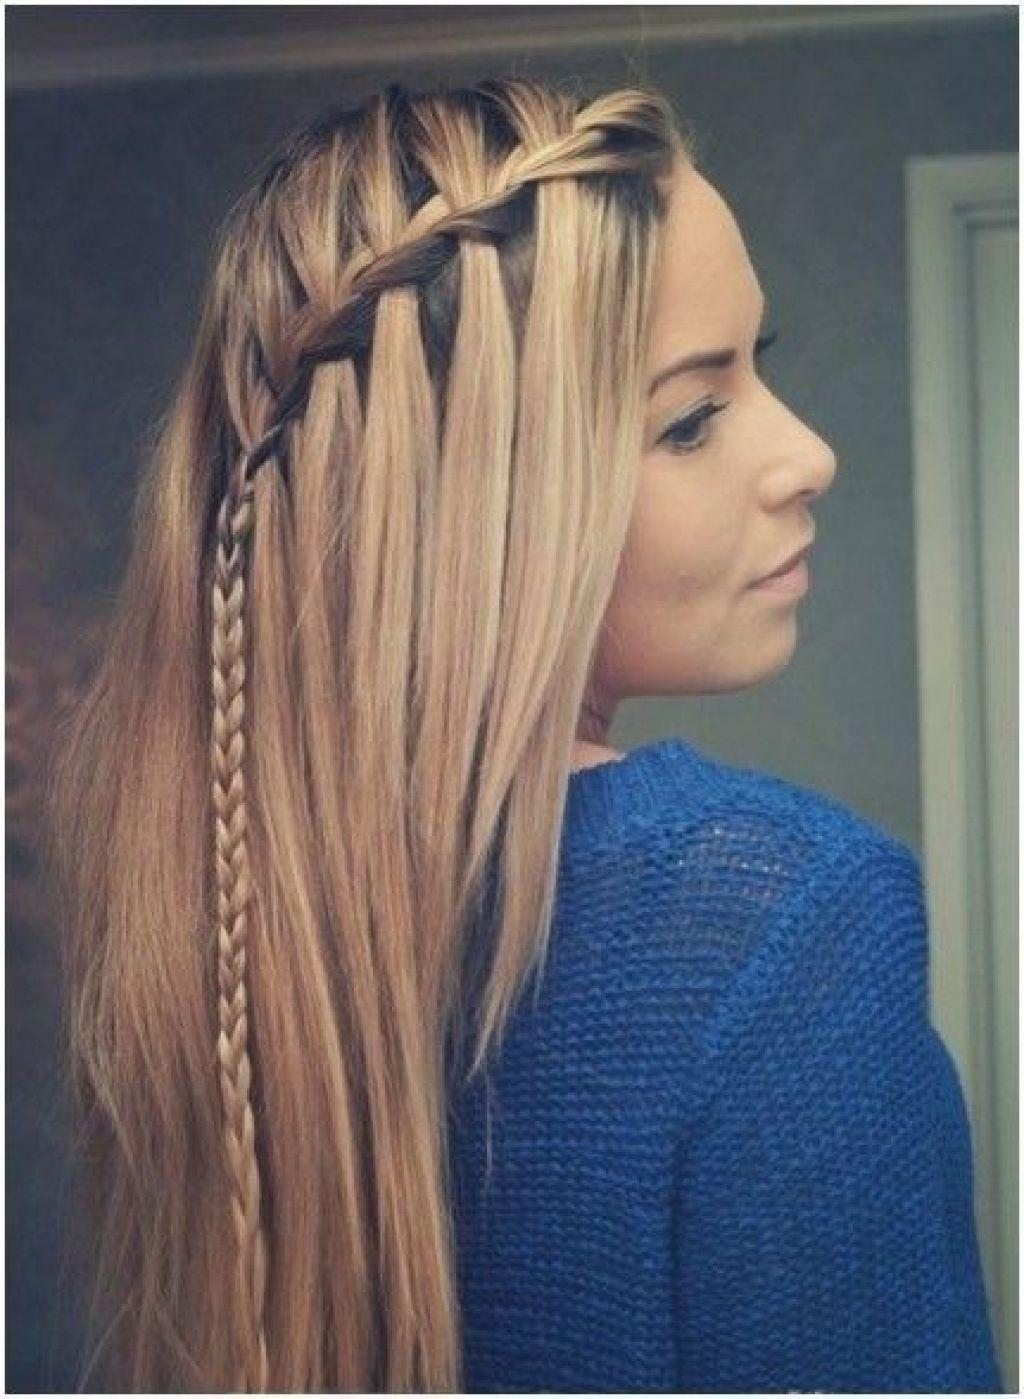 Cute Little Girl Hairstyles For Straight Hair Hairstyleblog Straight Hairstyles Long Hair Styles Hair Styles